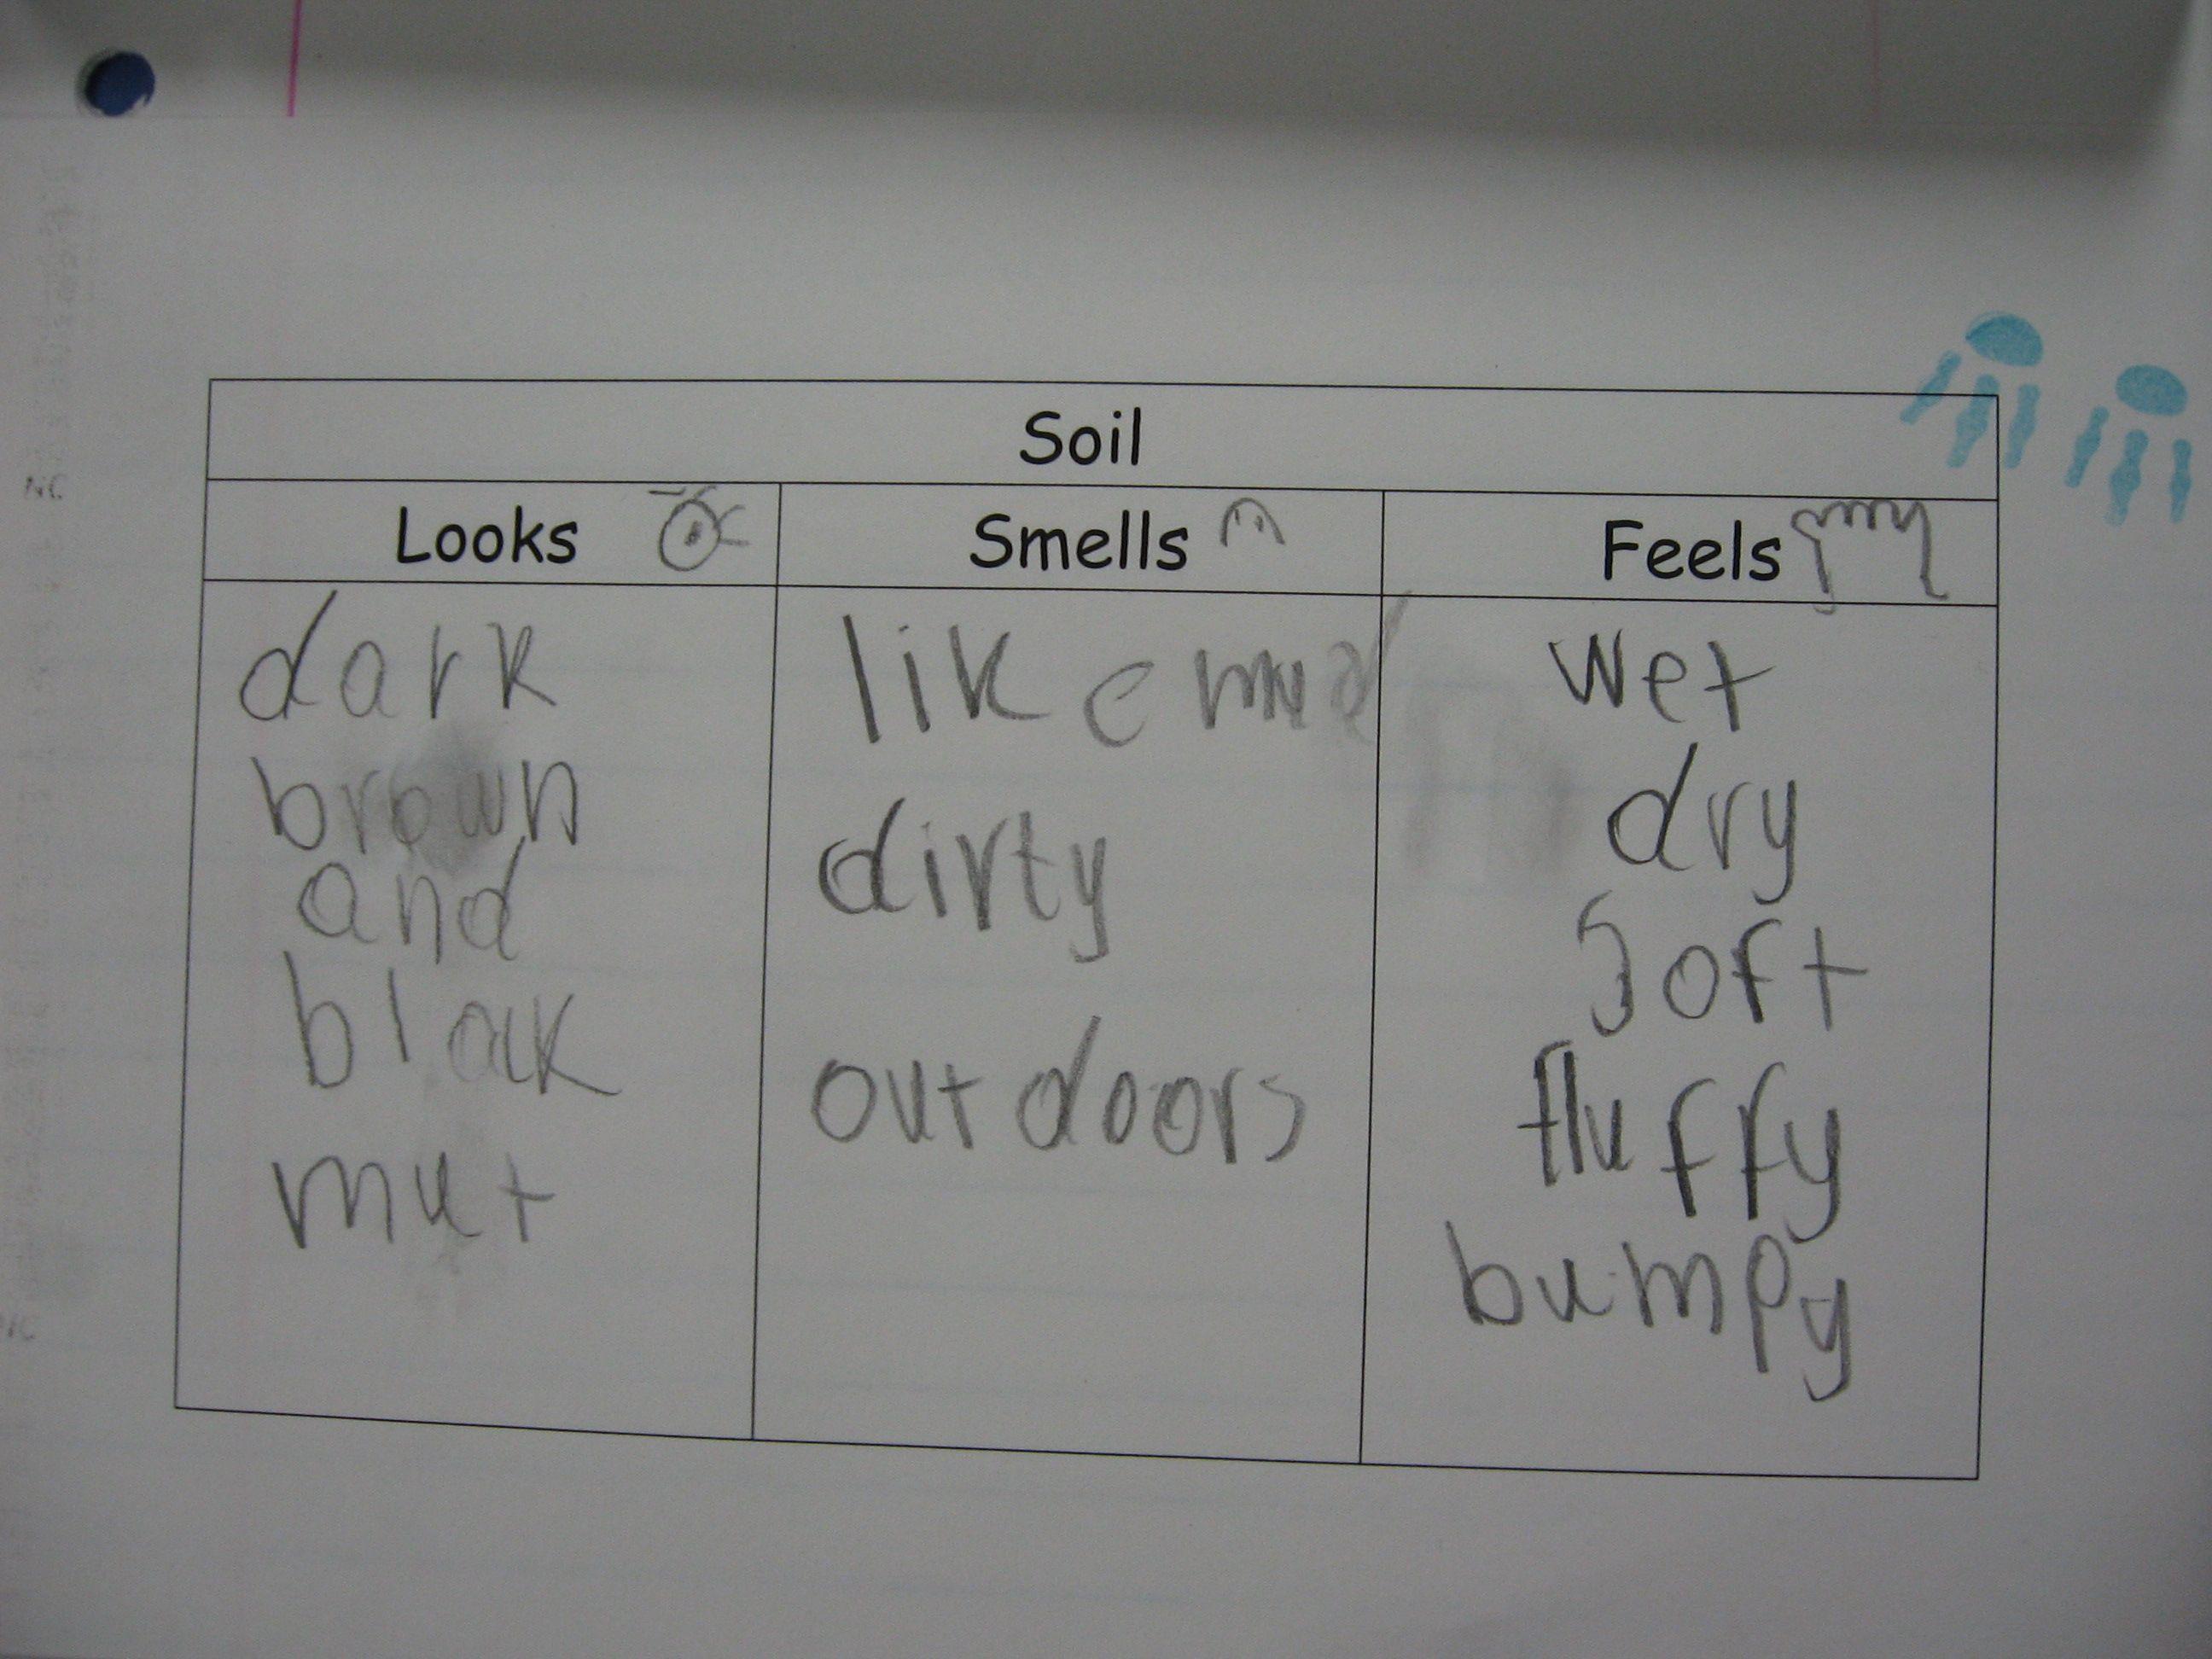 Soil Description Graphic Organizer